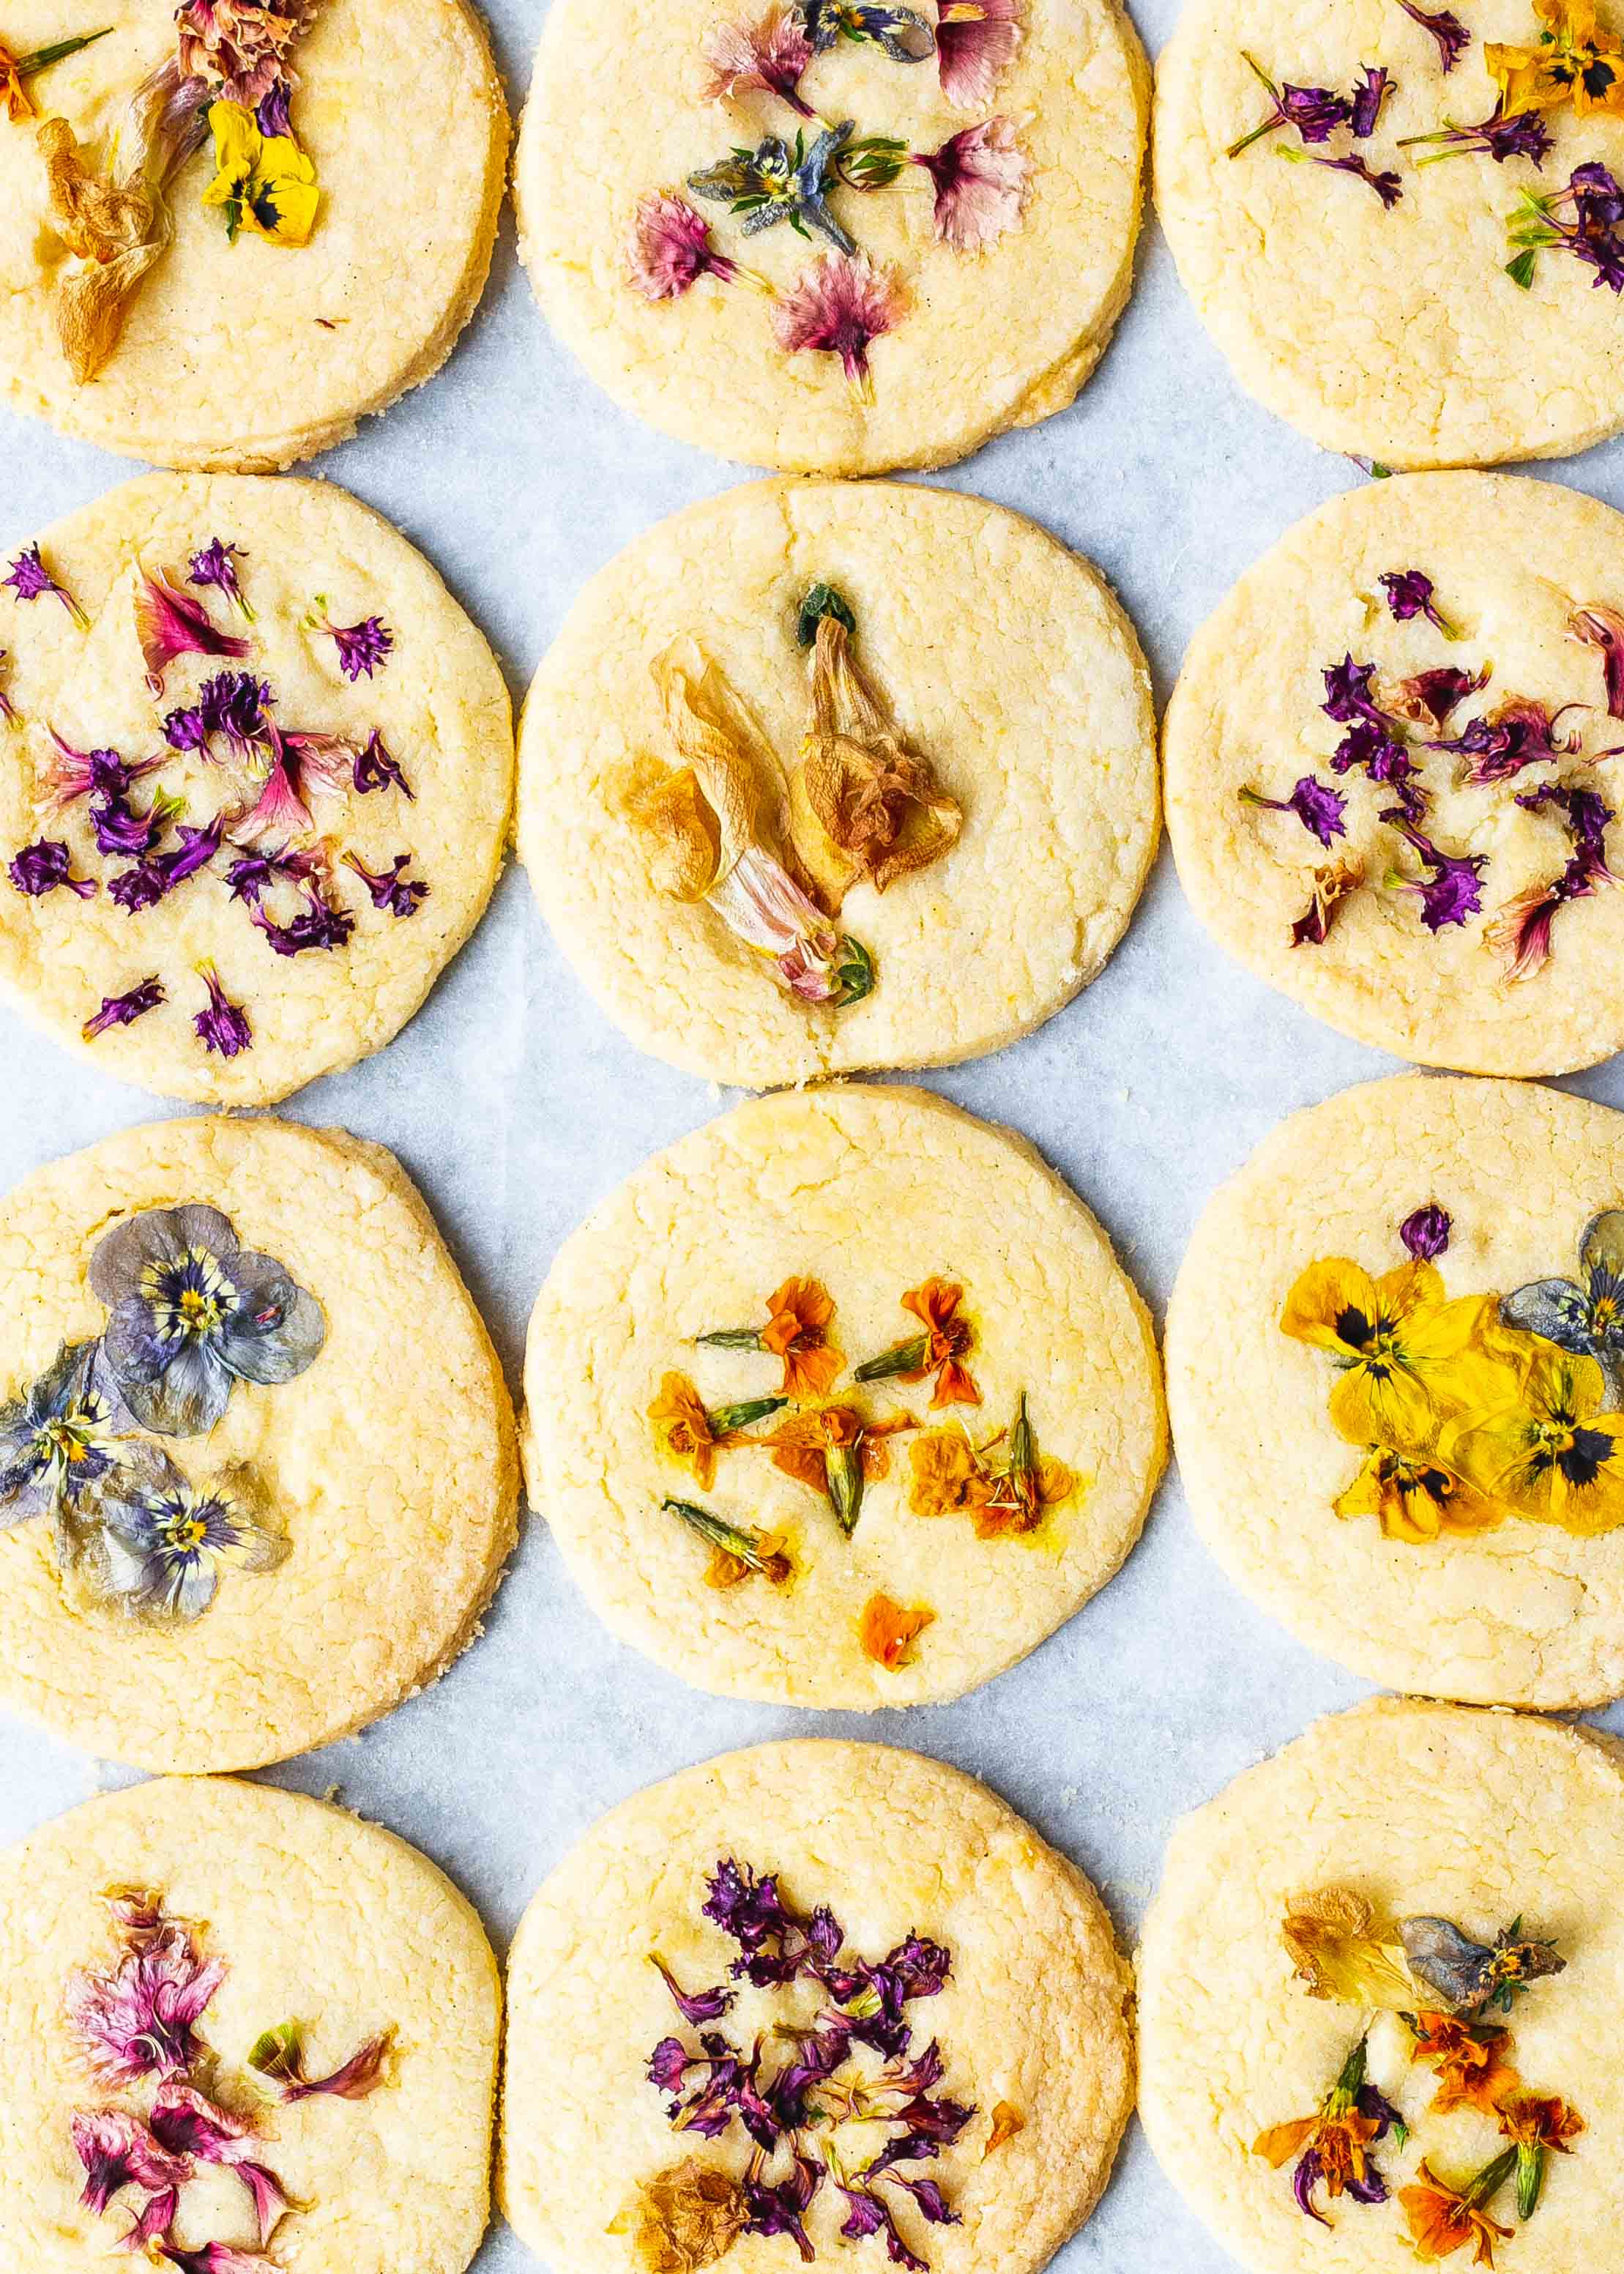 Edible flower FODMAP friendly shortbread cookies